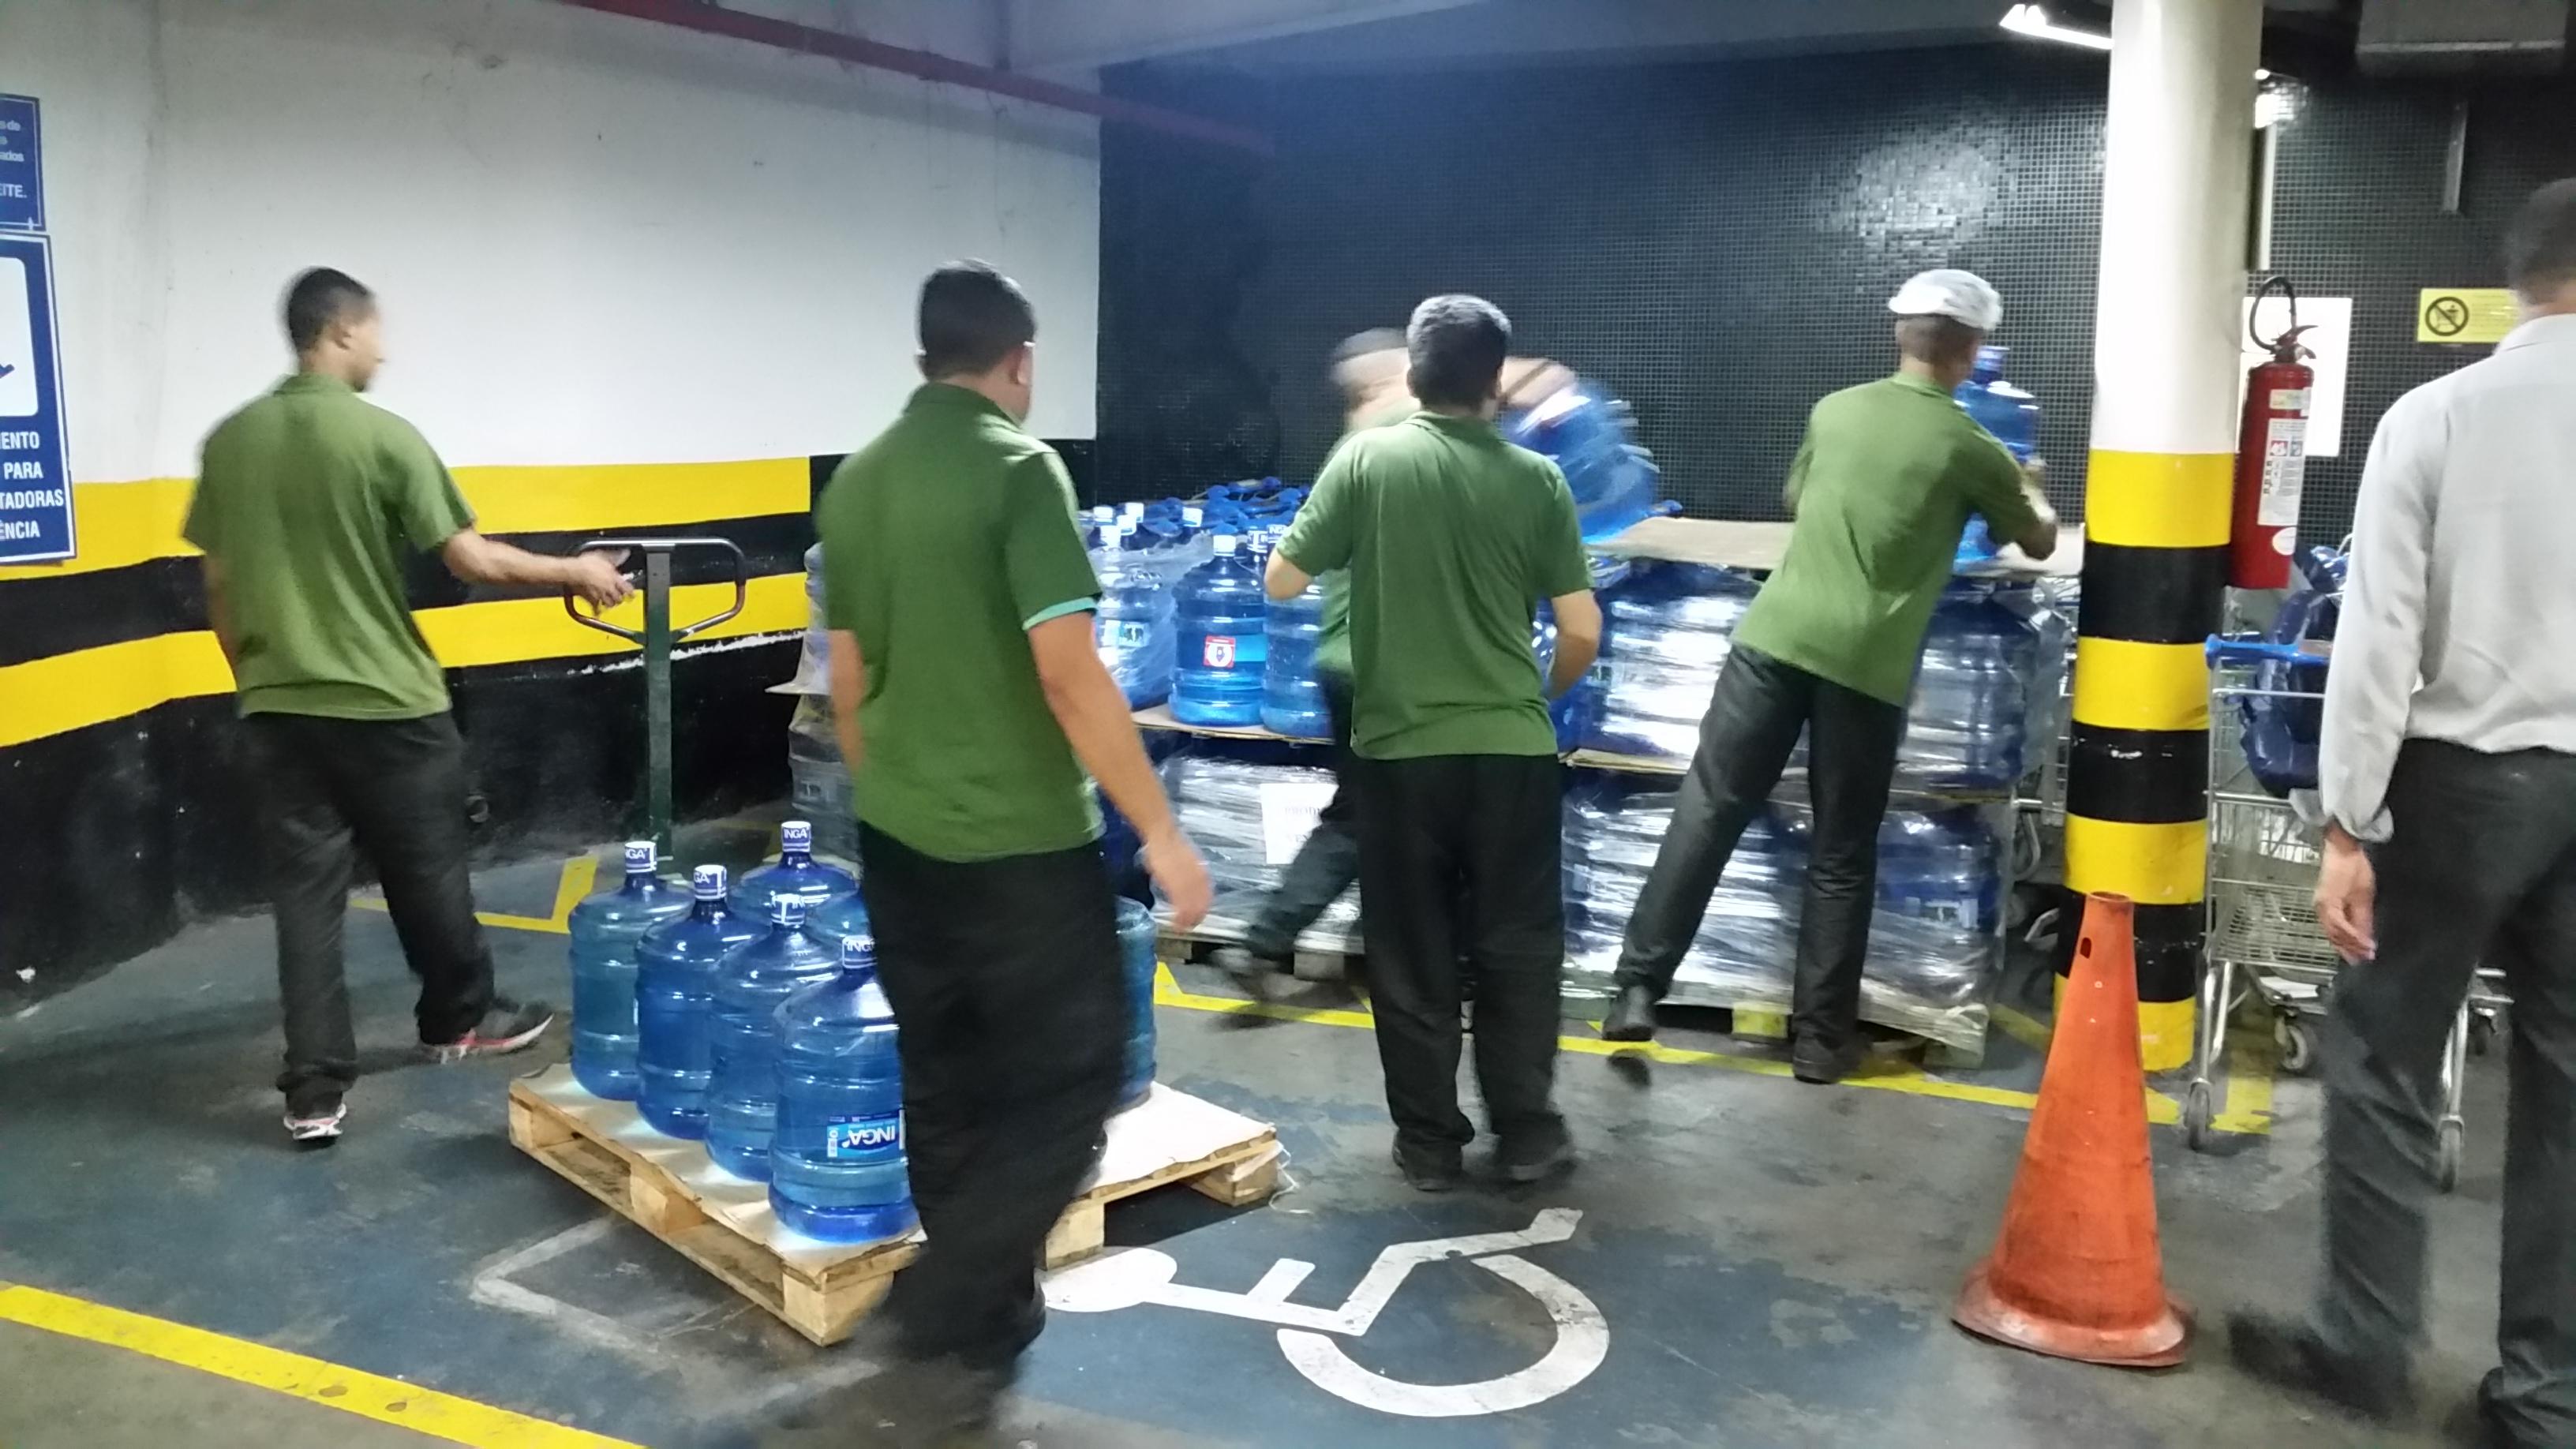 RBBV doa água aos atingidos pela lama da Samarco